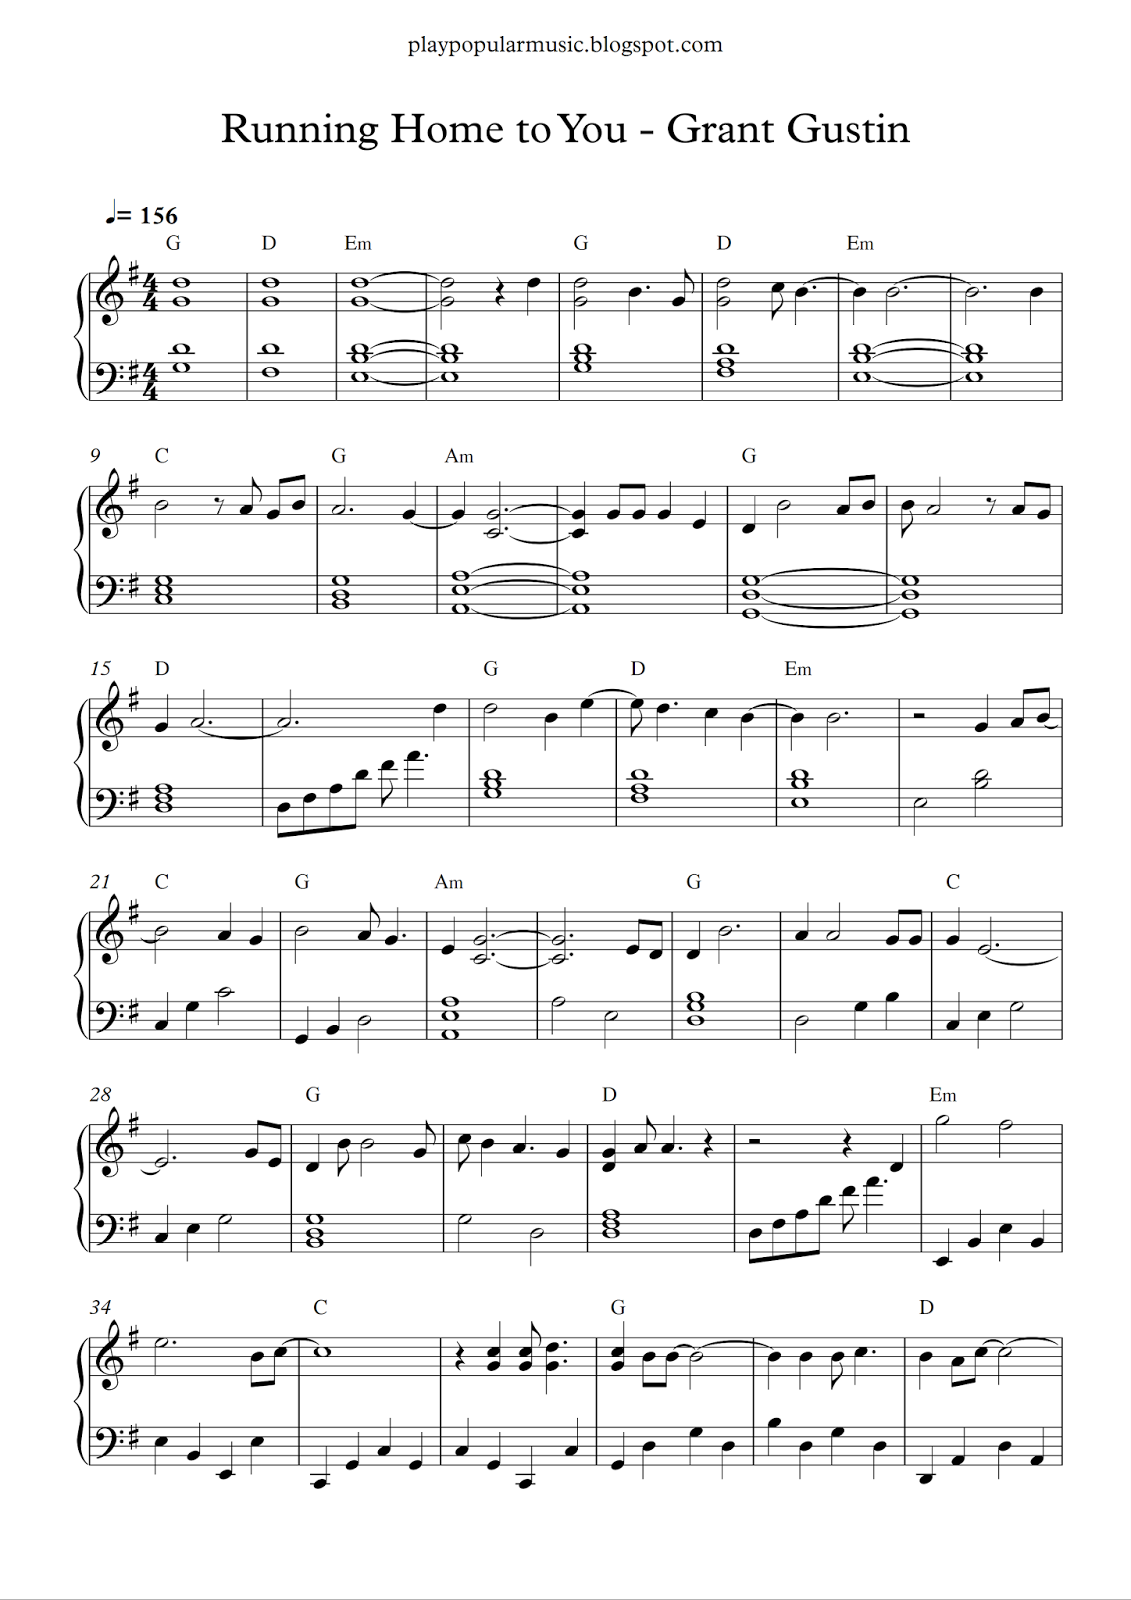 Free Piano Sheet Music Grant Gustin